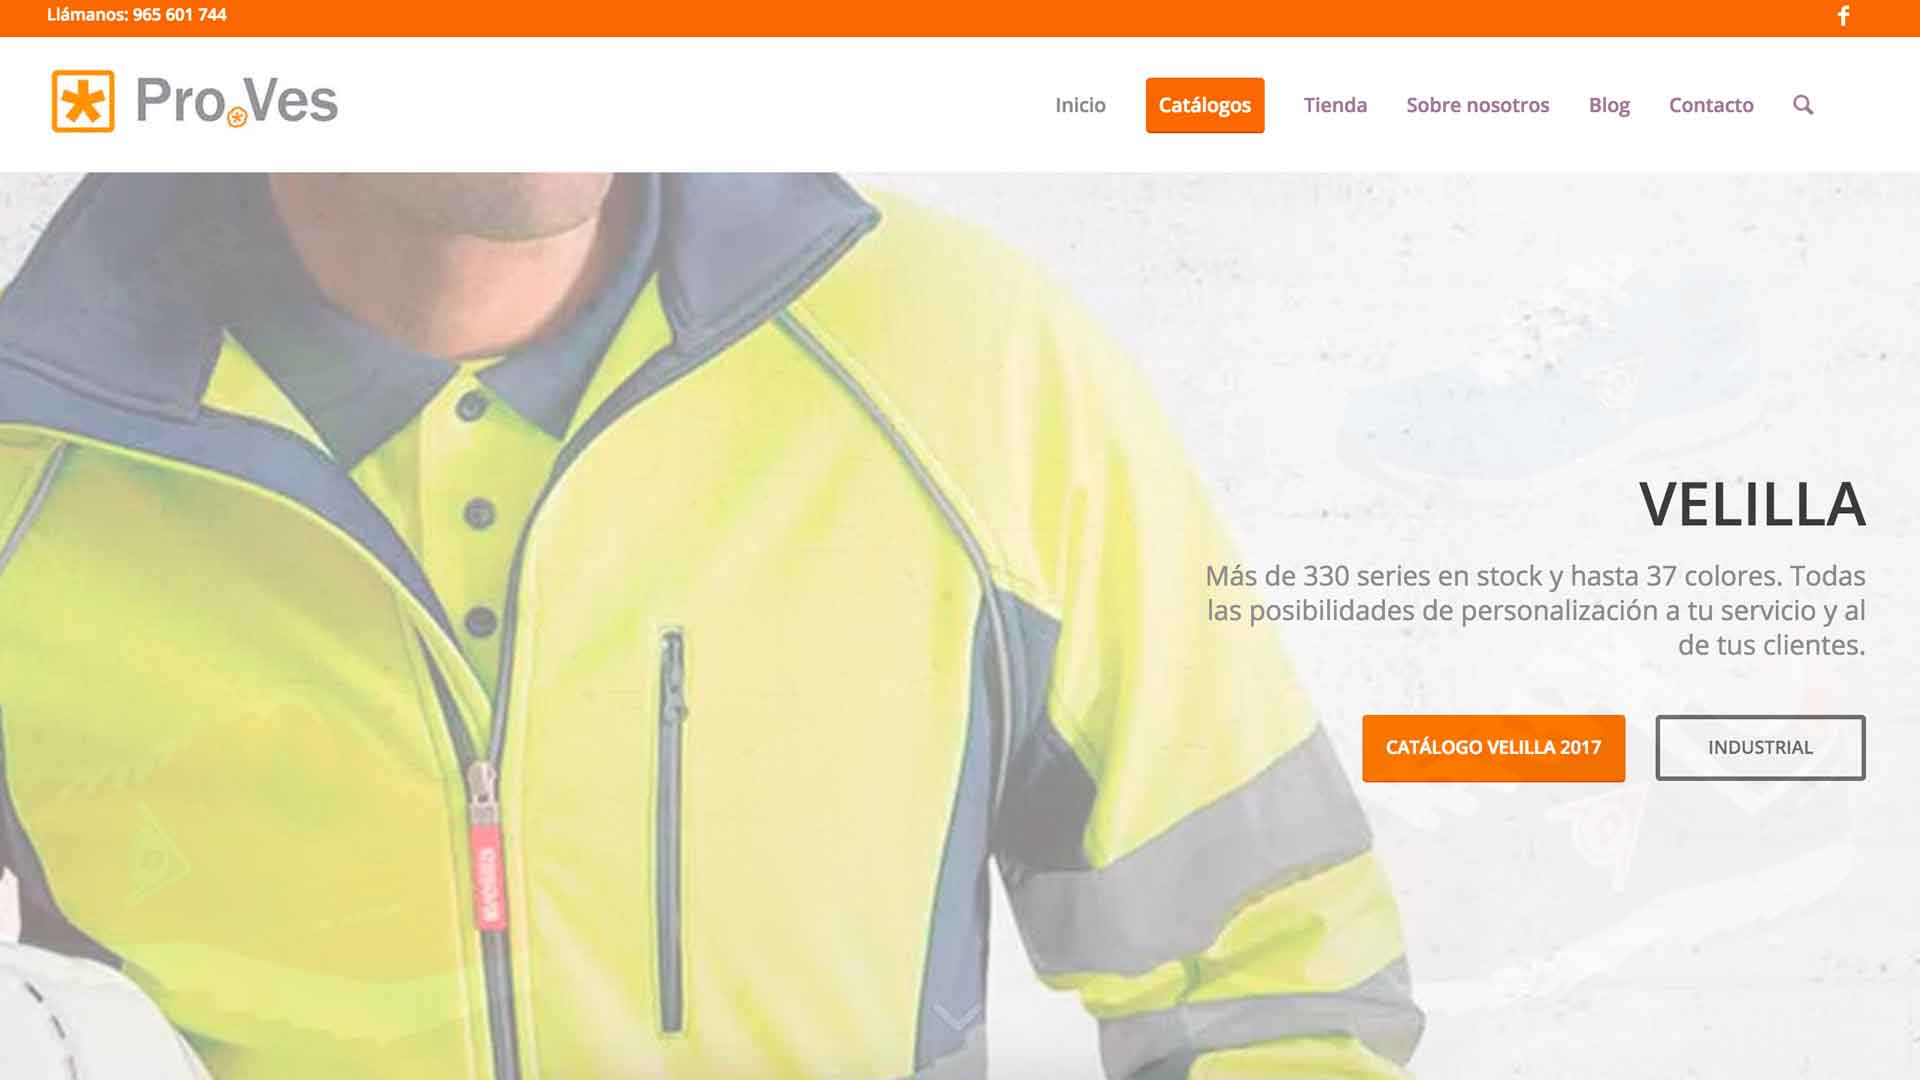 Agencia Sidecar agencia-sidecar-portfolio-proves-portada Pro.Ves